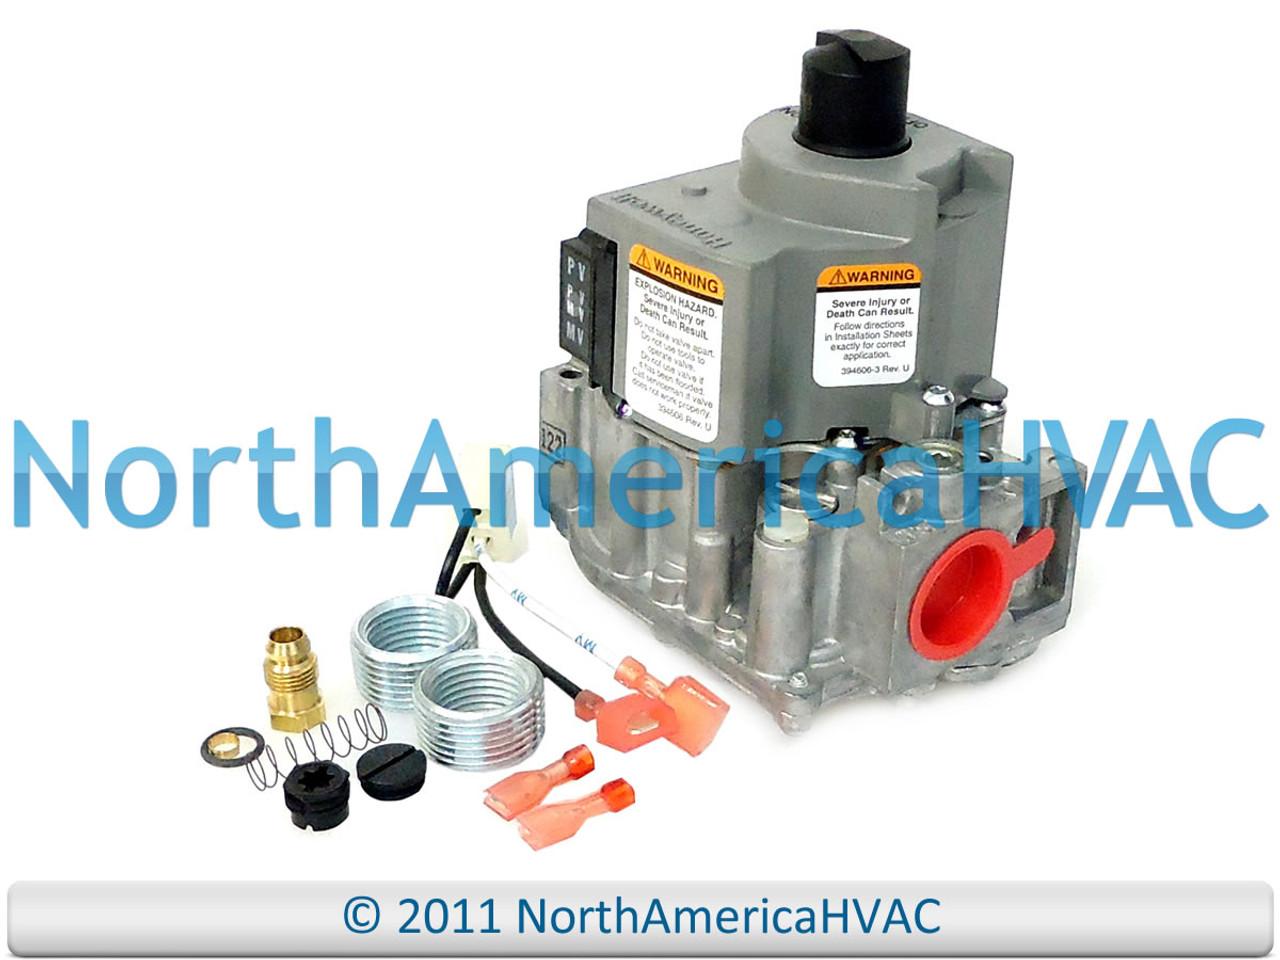 Honeywell Furnace Control Gas Valve Vr844n1003 Vr844n 1003